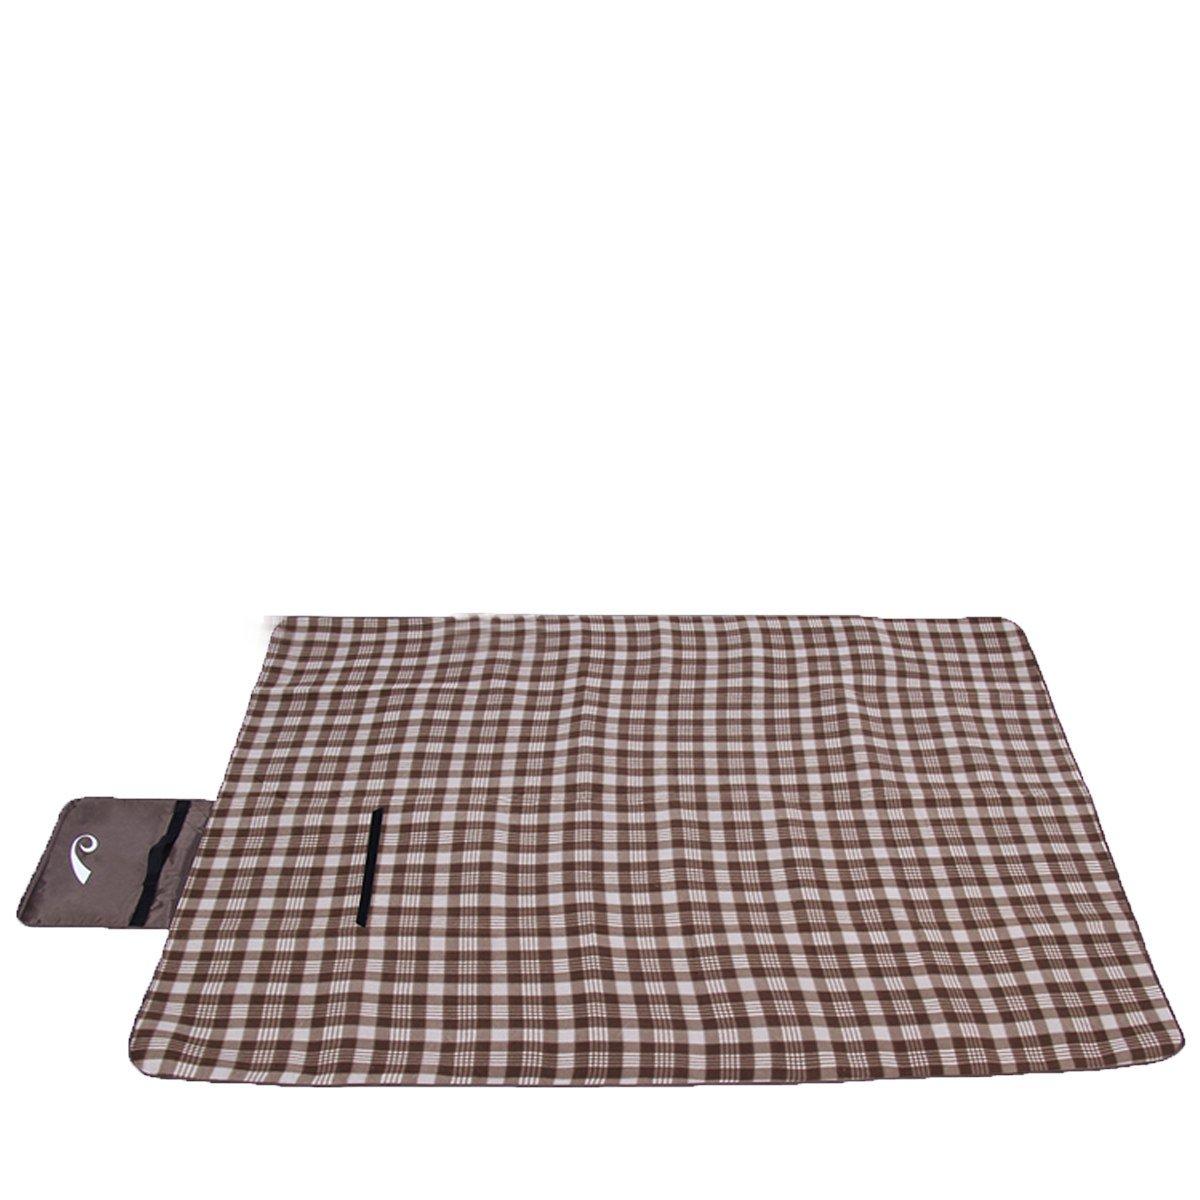 Outdoor Gear / Picknickmatte / Große / Wasserdicht / Isomatte / Reise Notwendig,Brown-70.9*57.1(in)